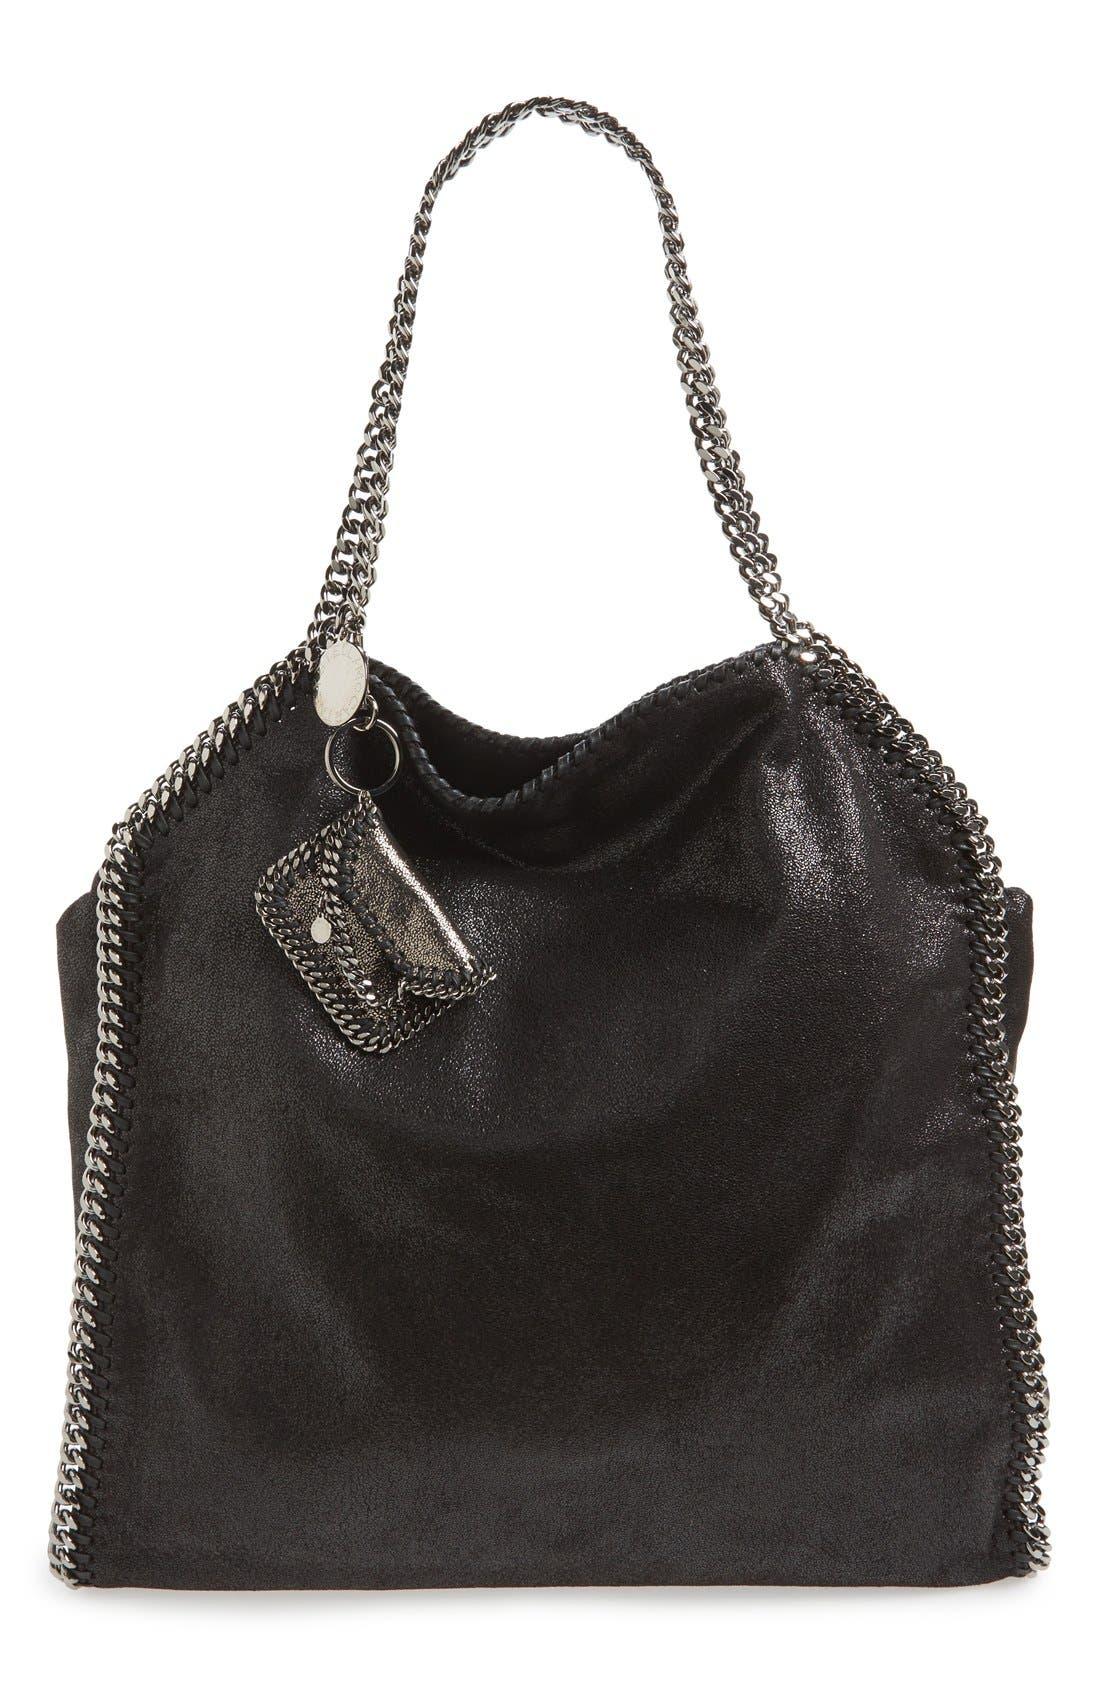 Alternate Image 2  - Stella McCartney 'Falabella' Bag Charm